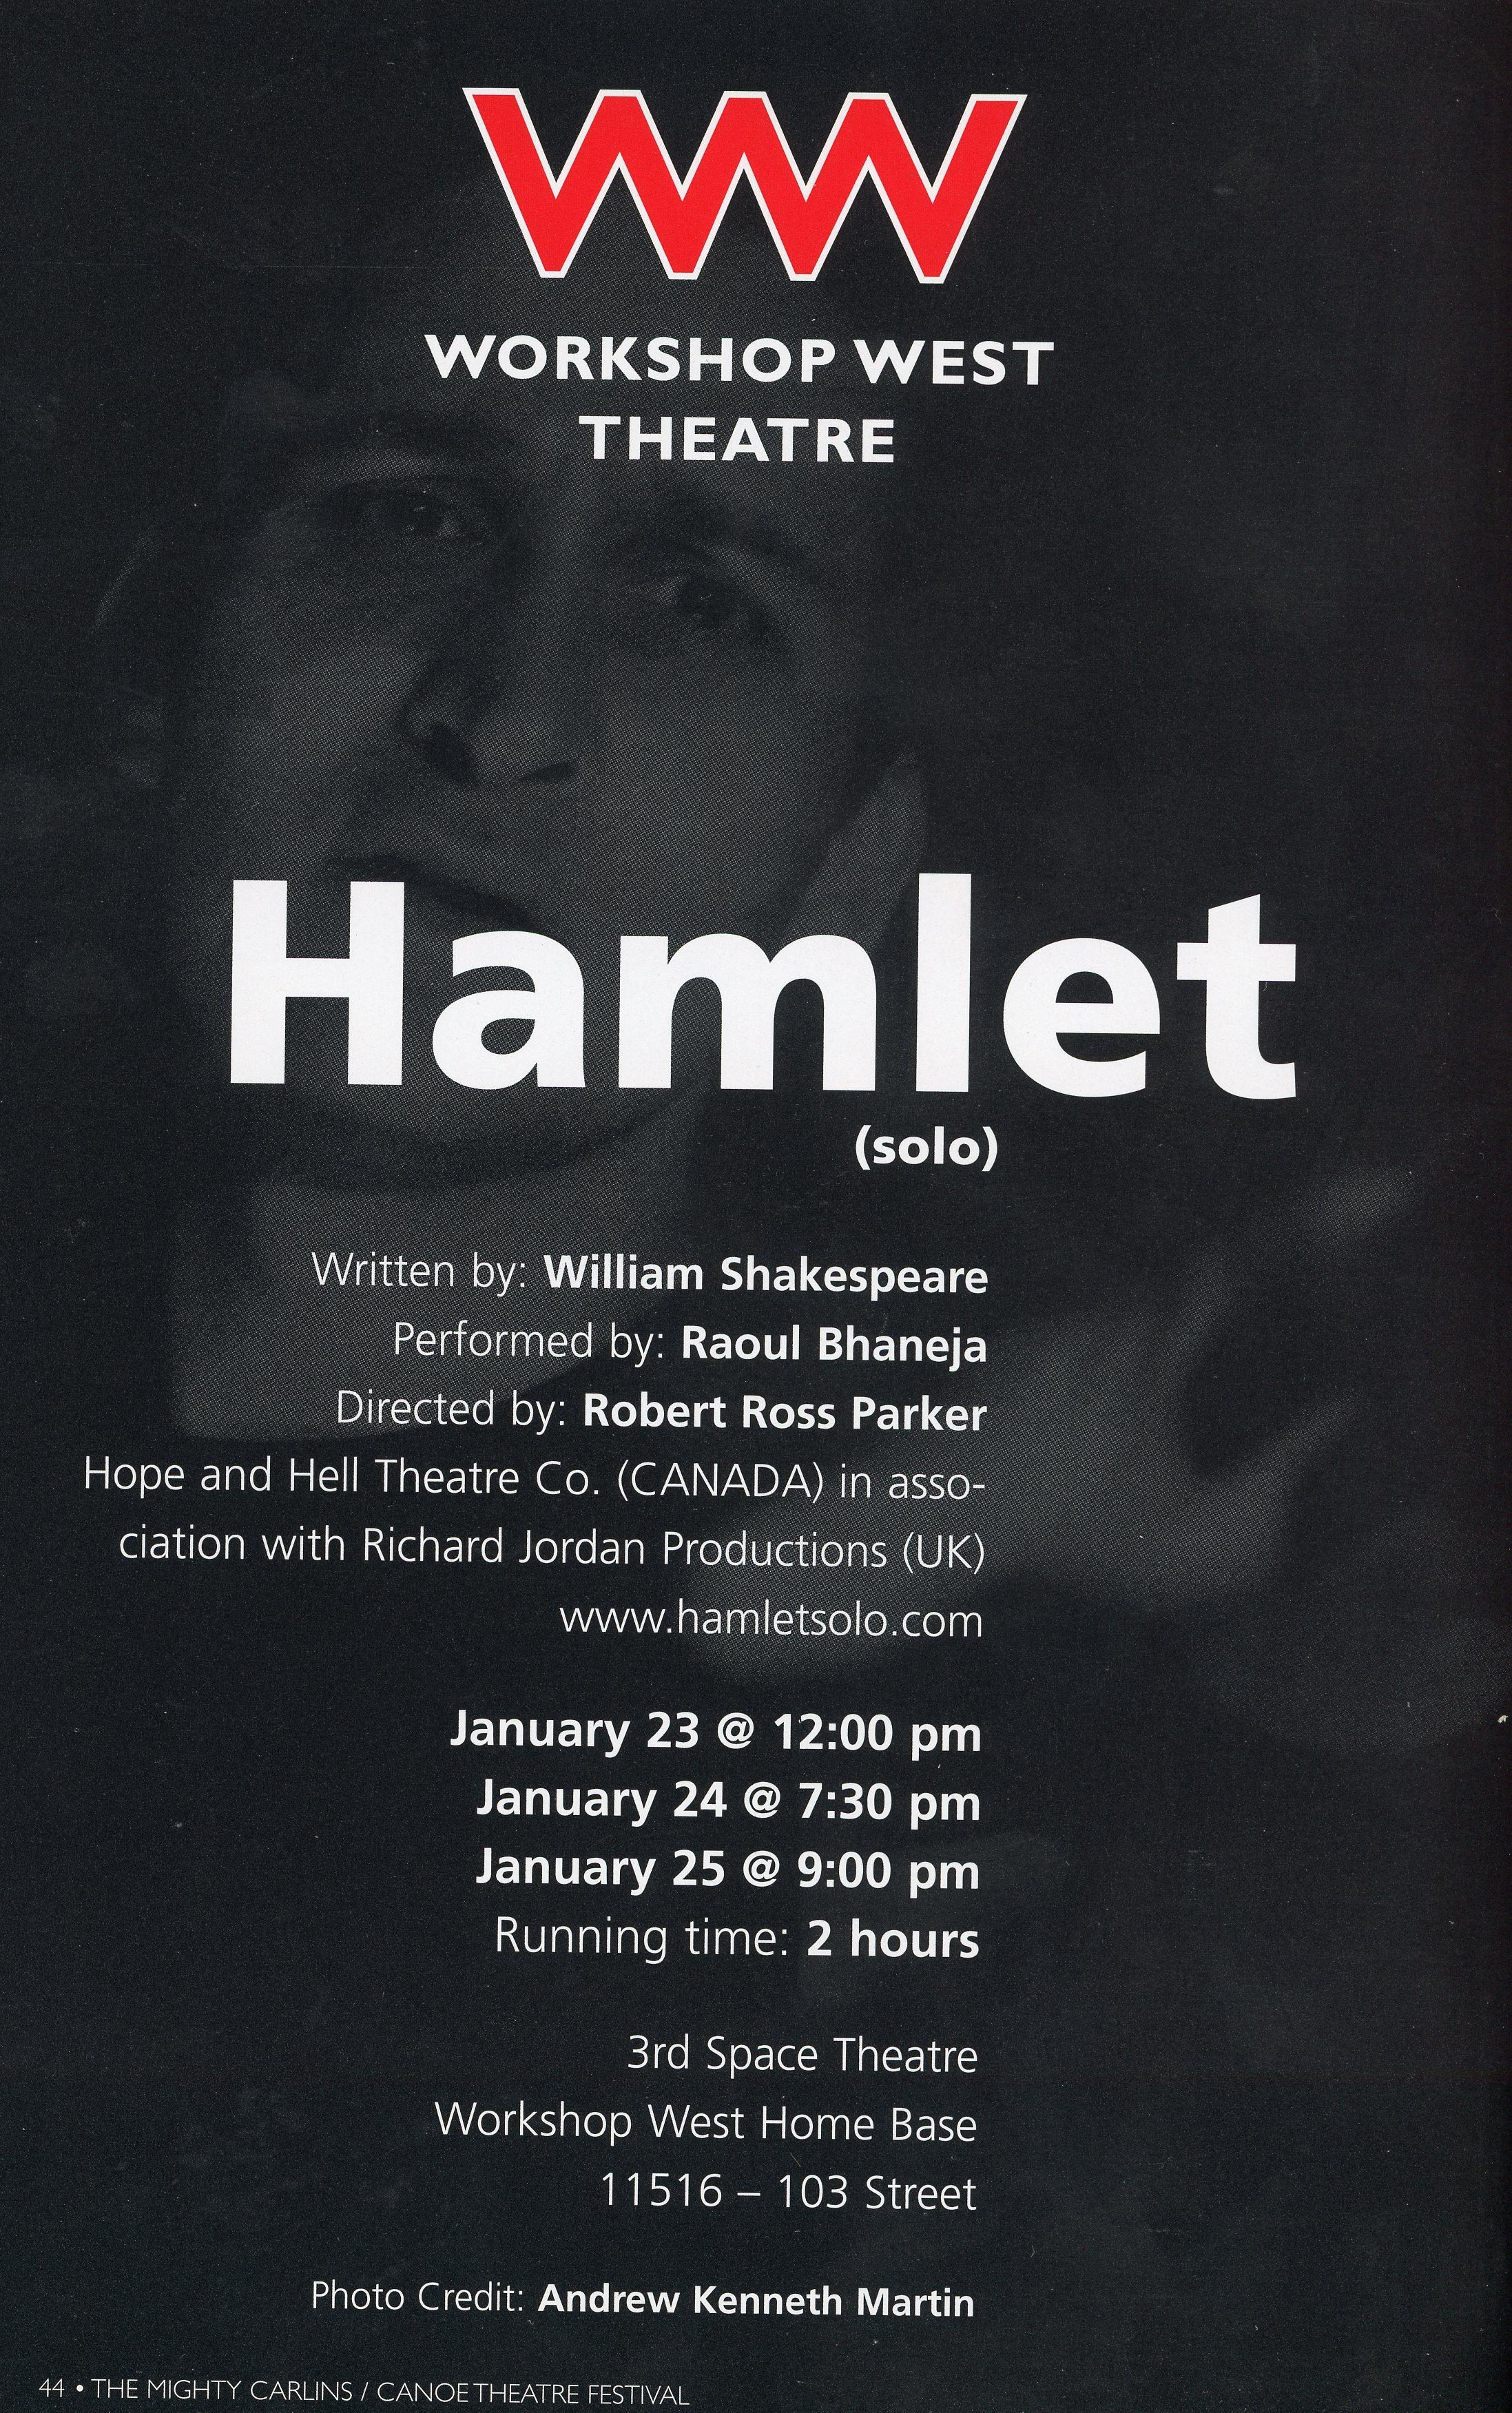 Workshop West Theatre (2008)-Production Information-Hamlet_JPEG.jpg